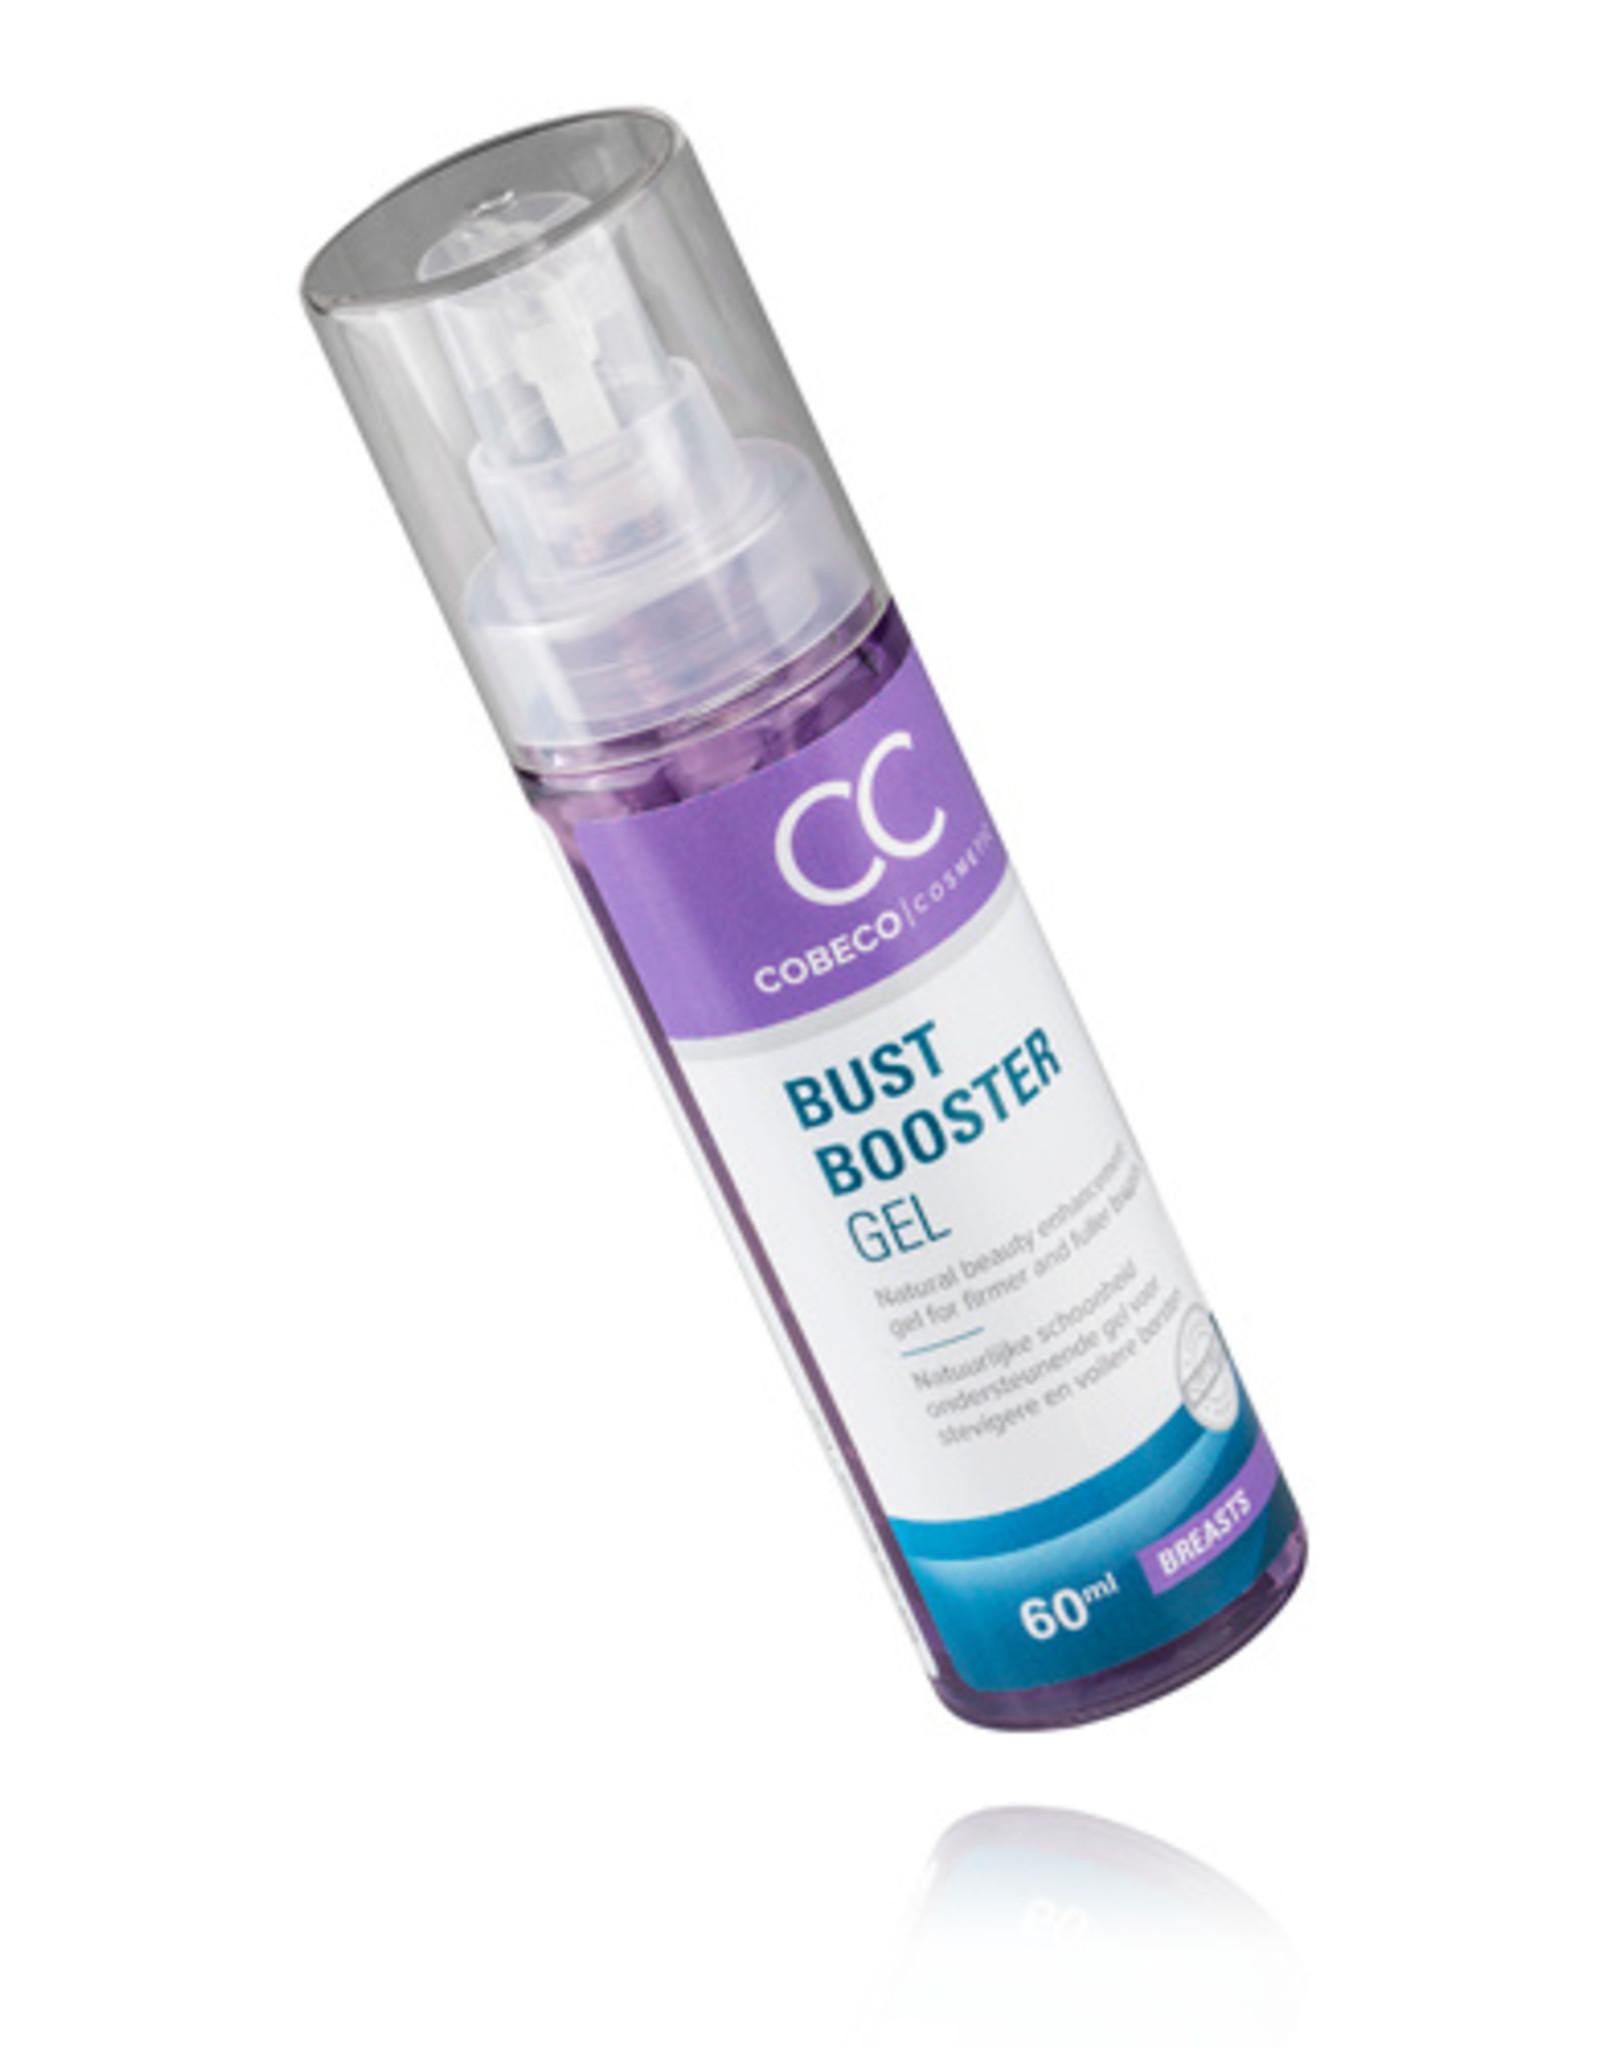 Cobeco Pharma Bust Booster Borstgroei Crème